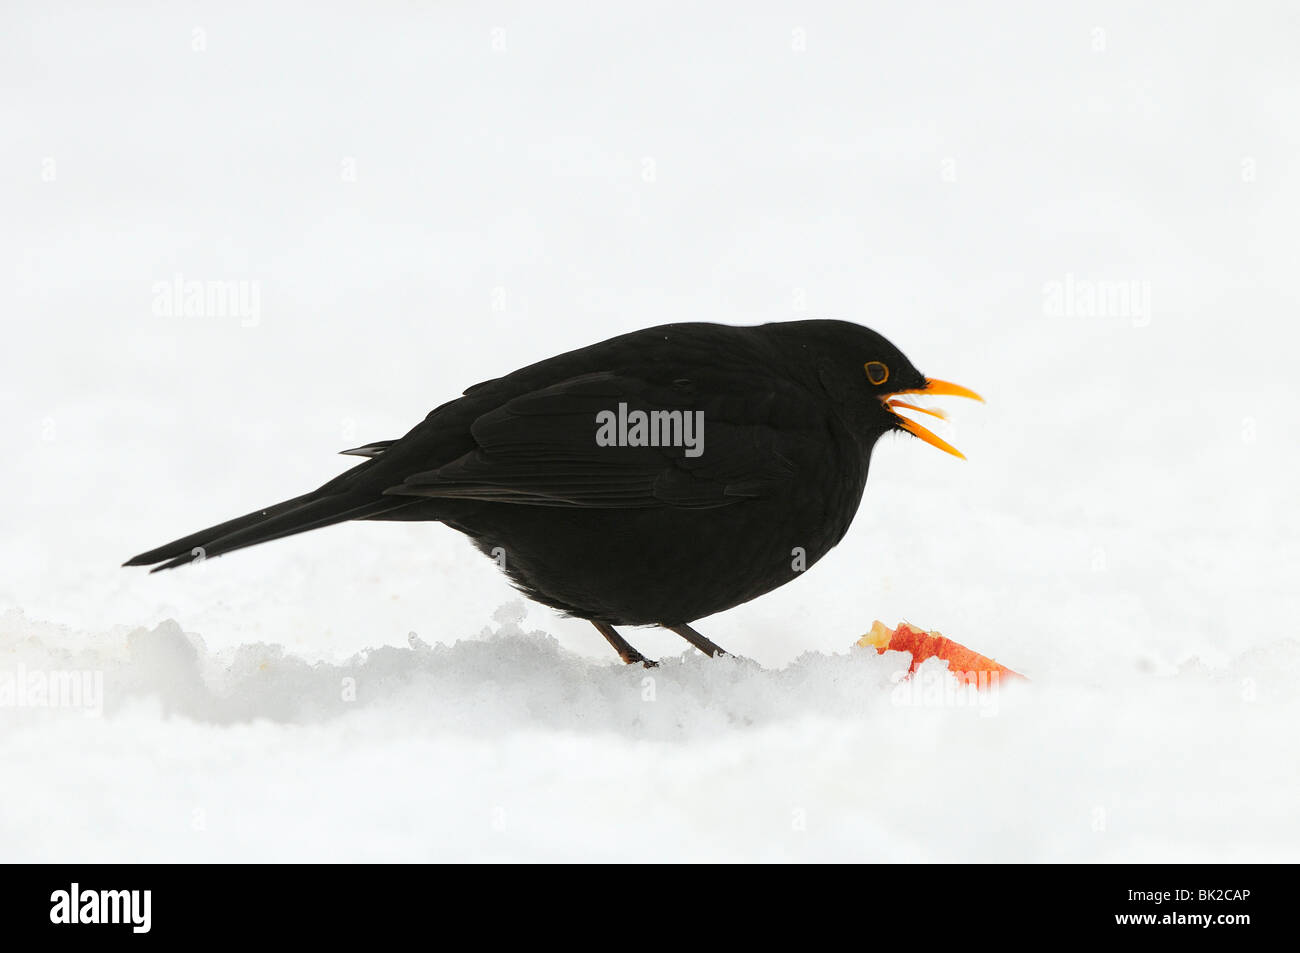 Blackbird (Turdus merula) male in snow feeding on apple, Oxfordshire, UK. - Stock Image